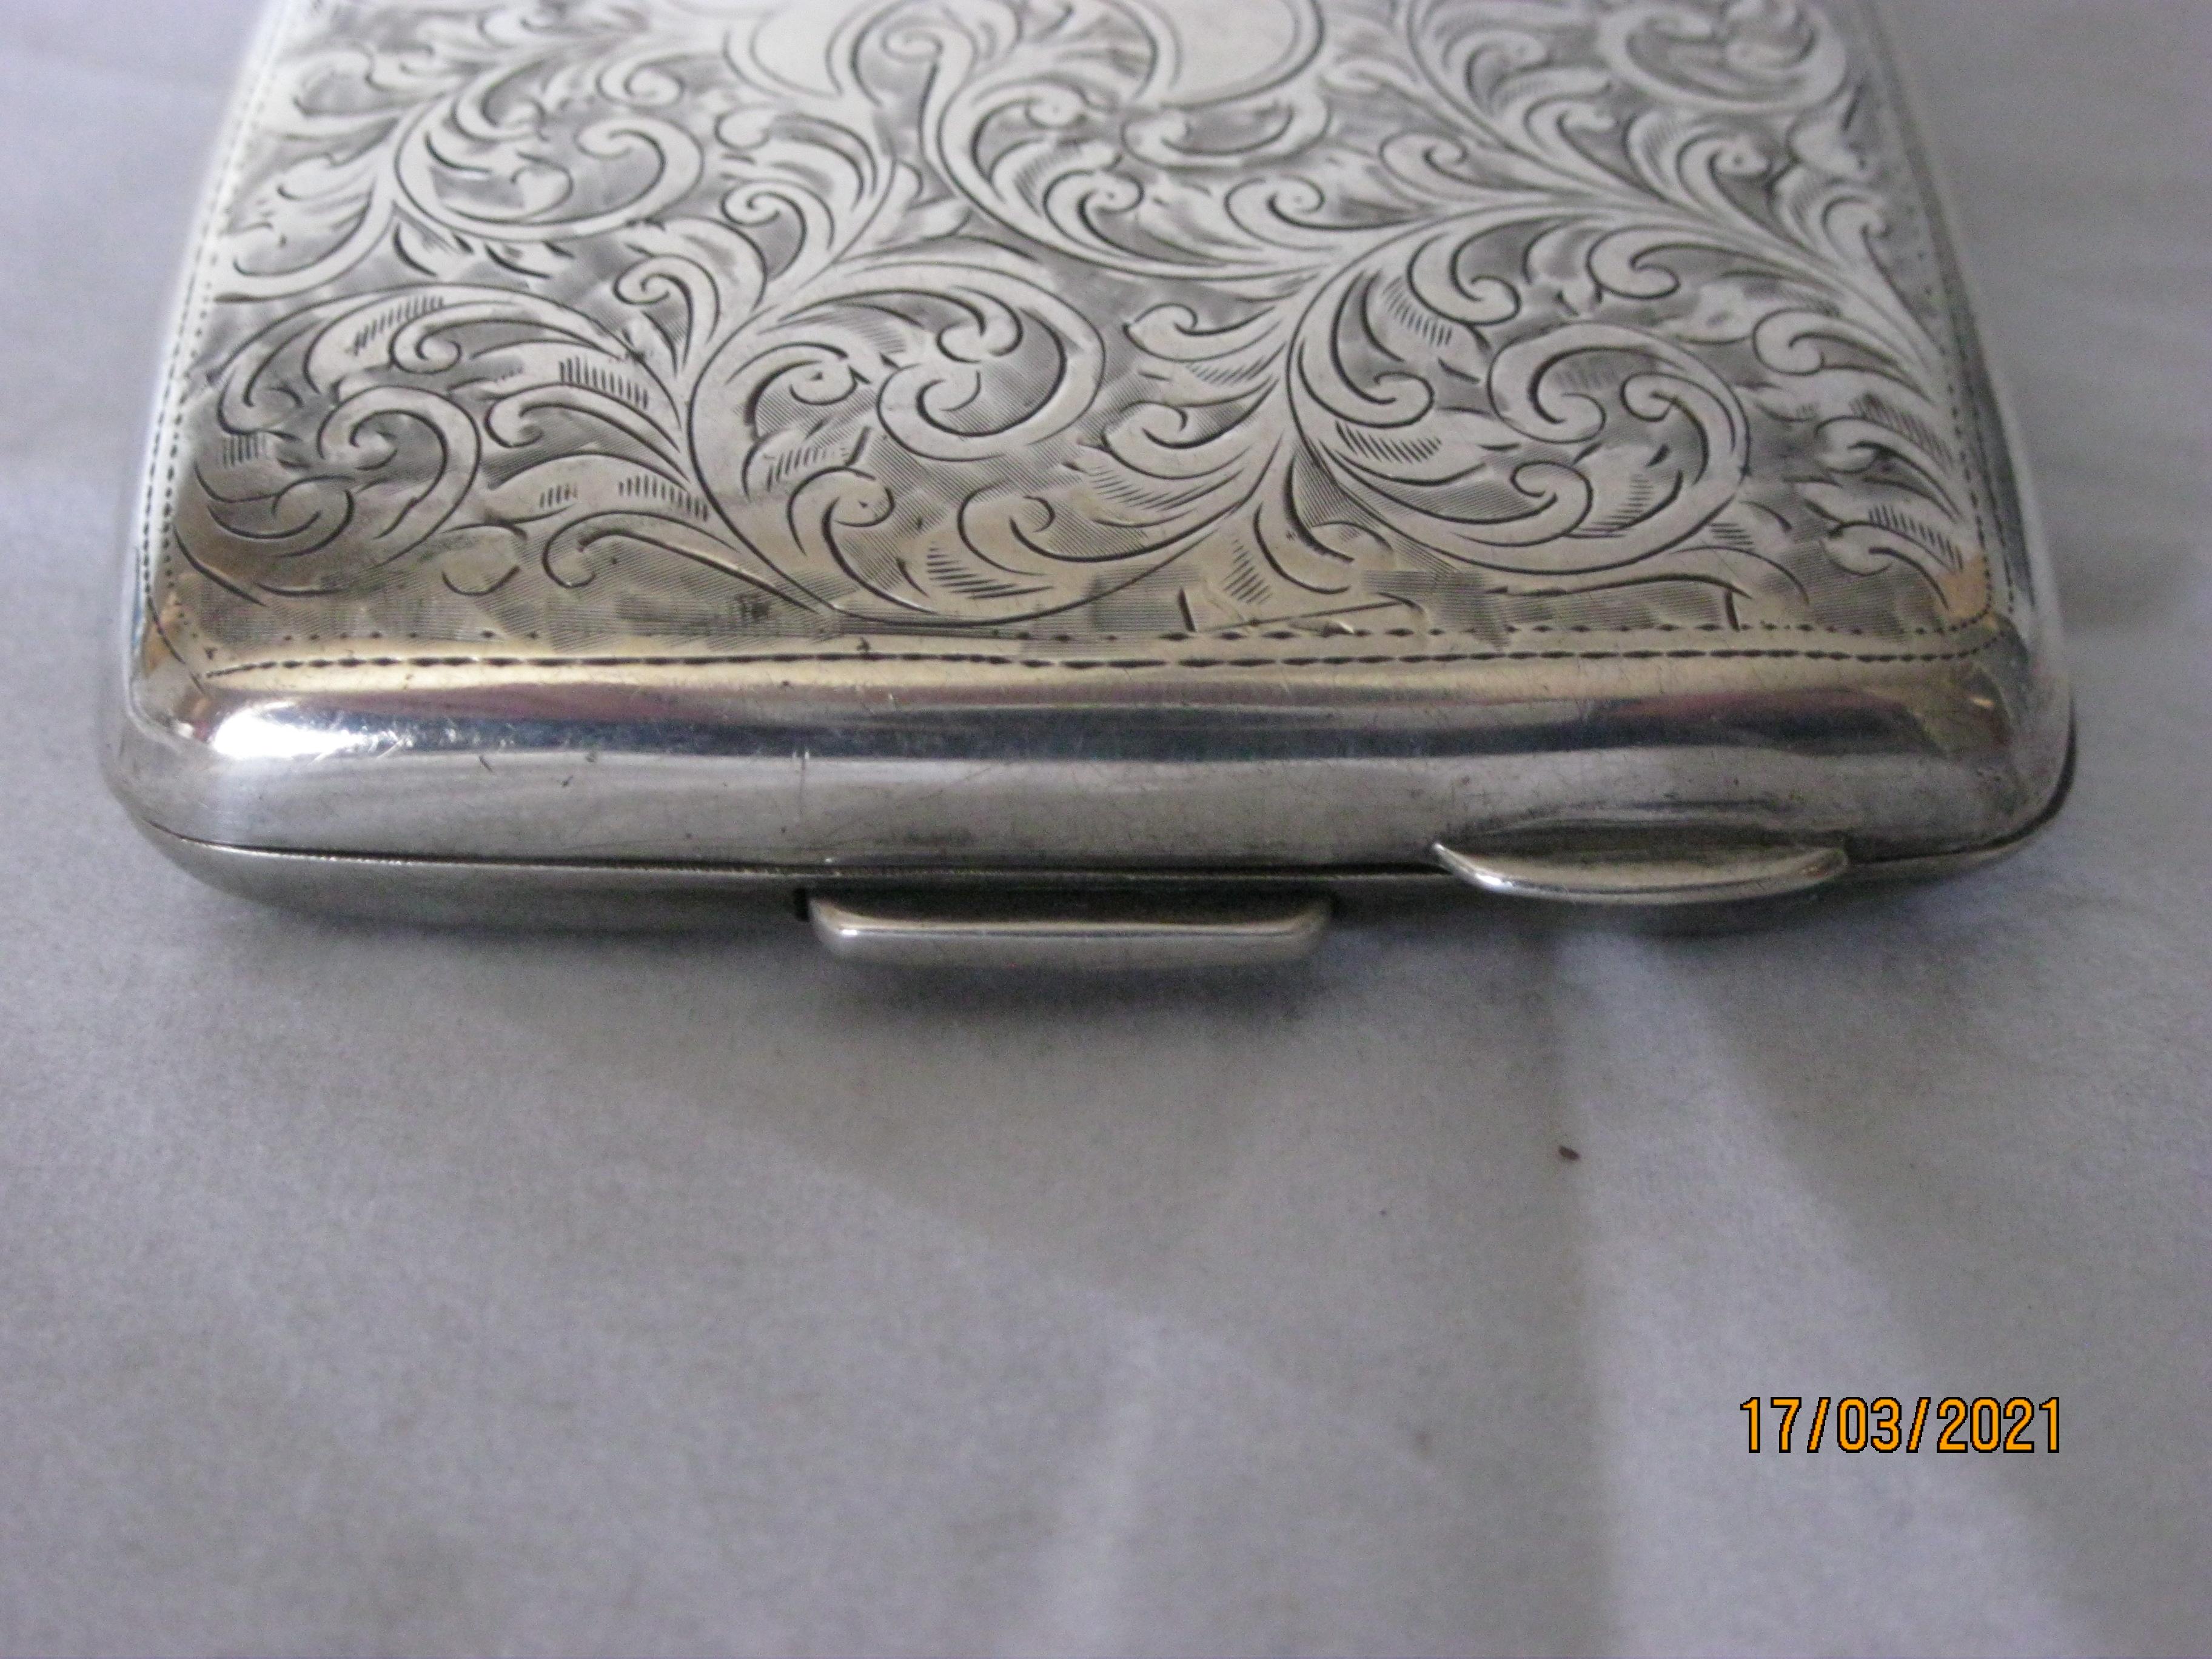 Antique Sterling Silver Cigarette Case 1921 - Image 4 of 11